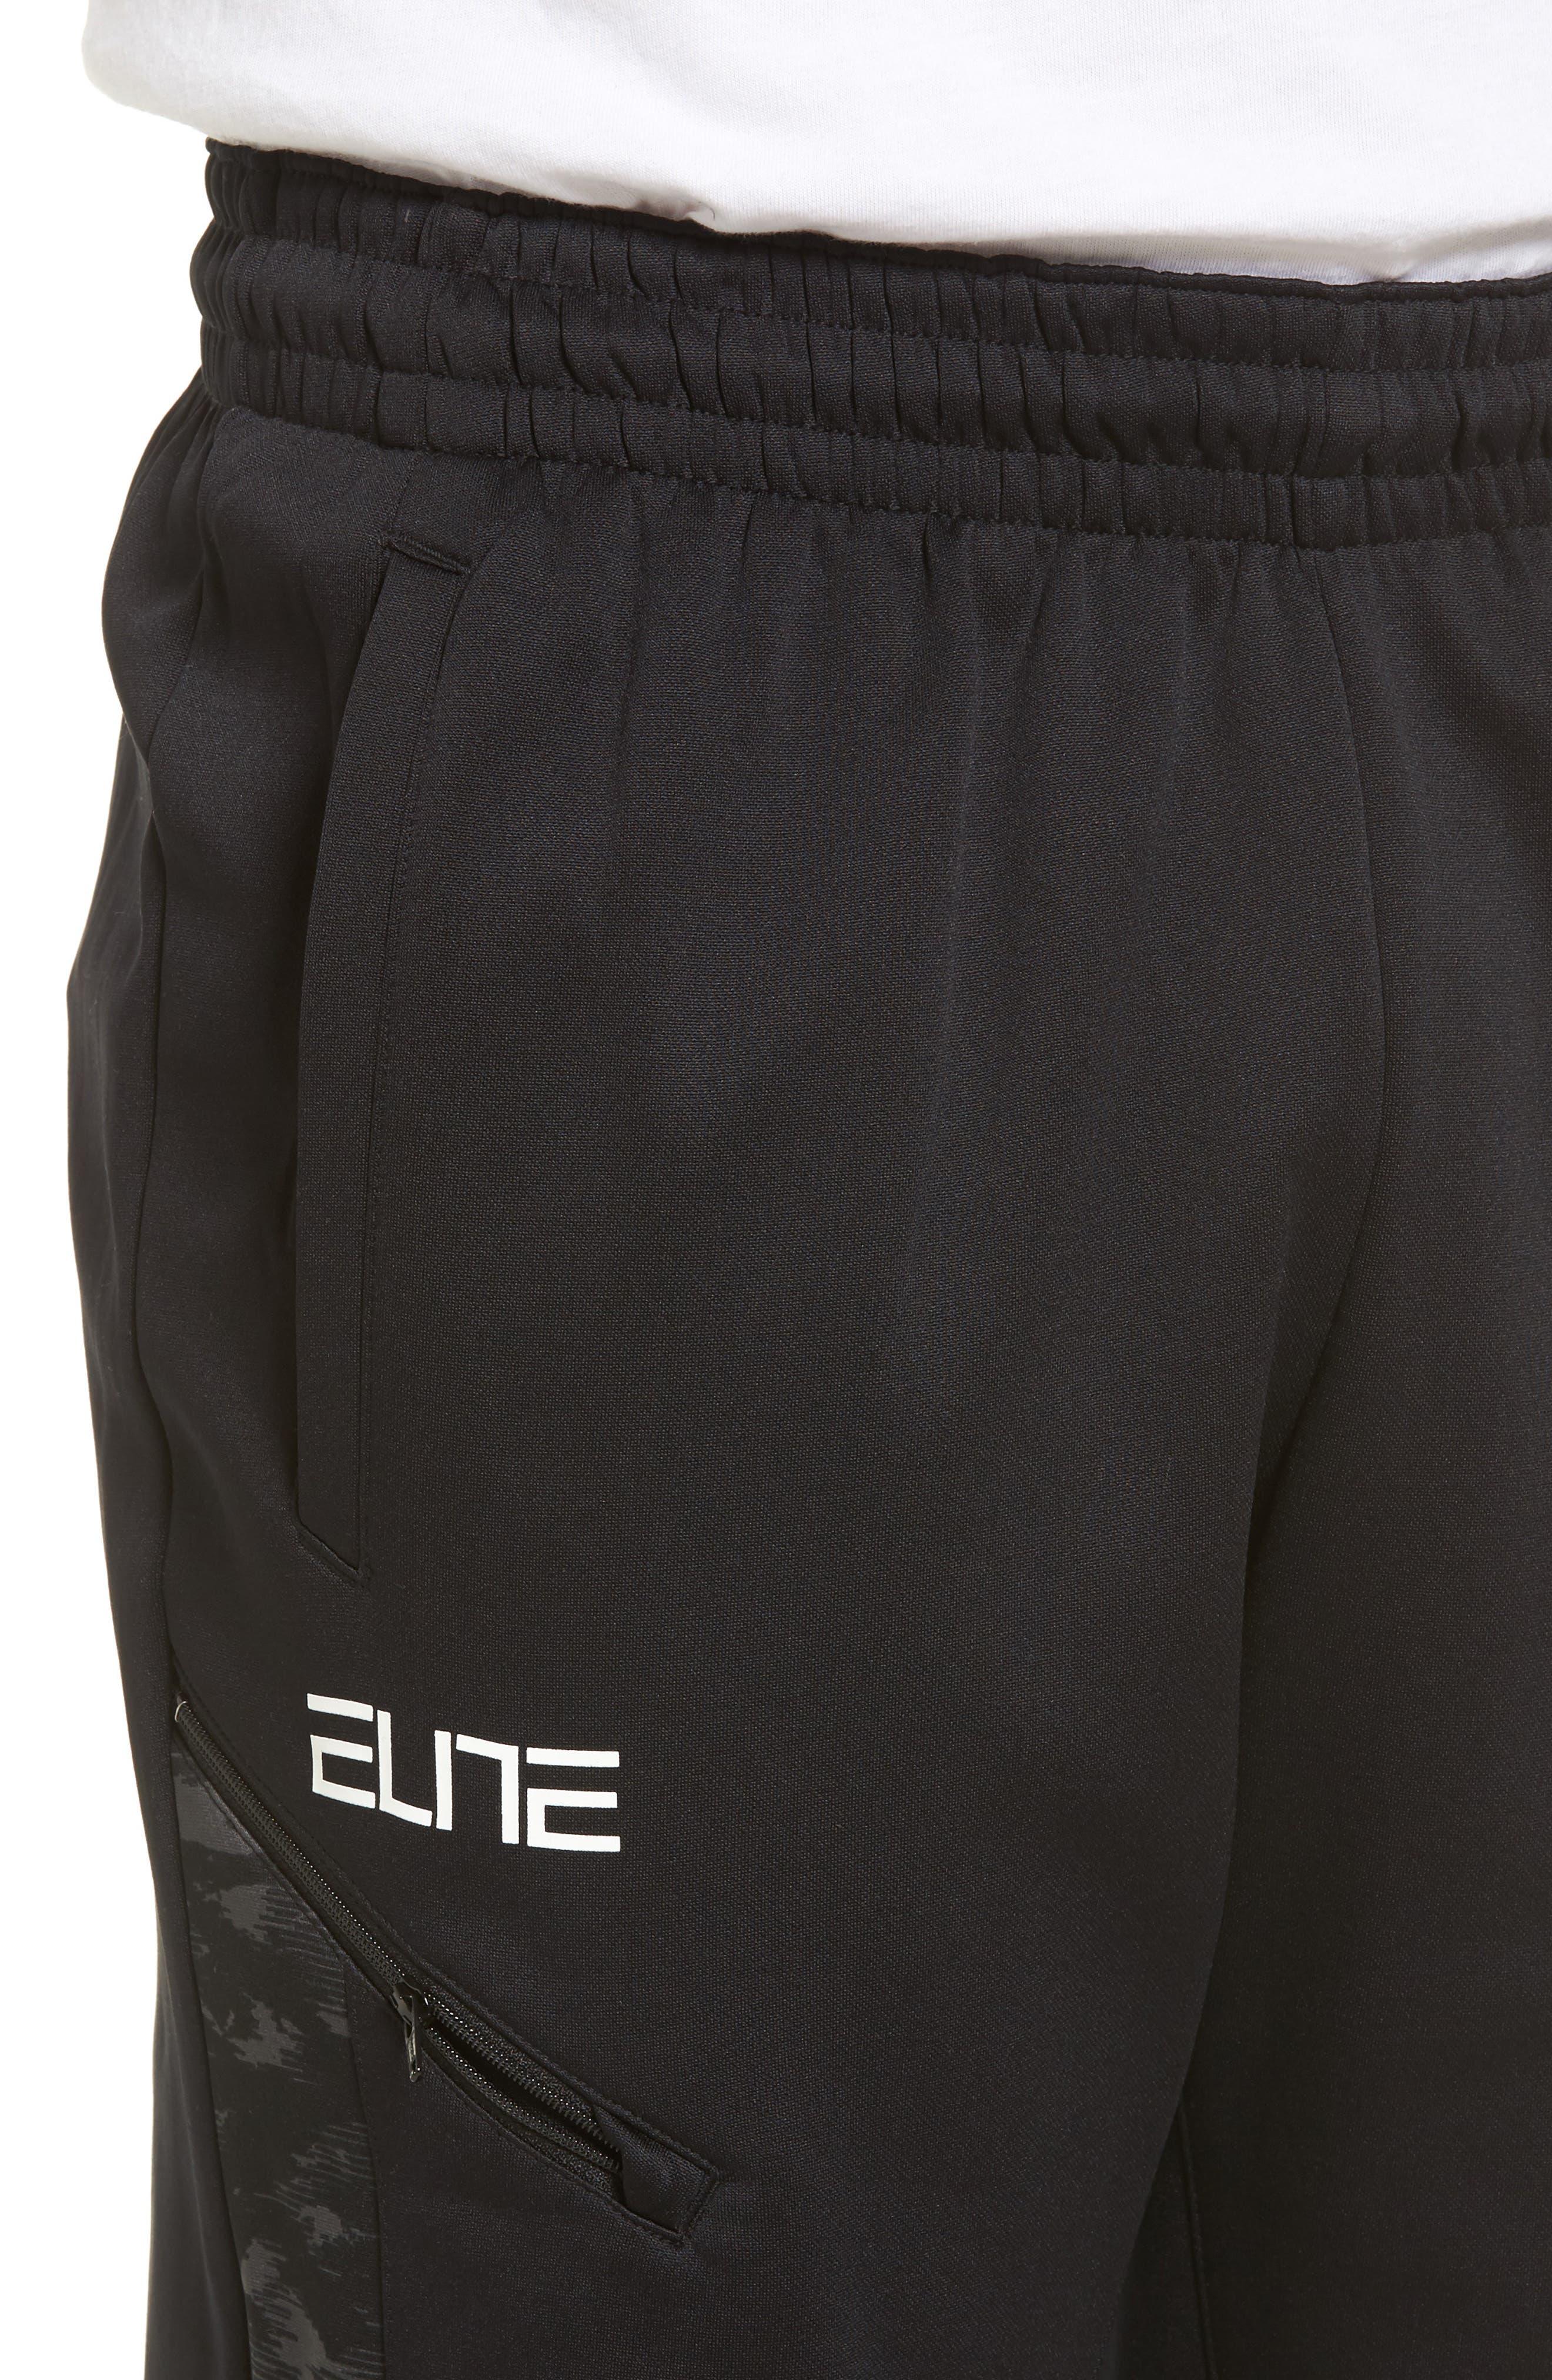 Therma Elite Basketball Pants,                             Alternate thumbnail 4, color,                             010